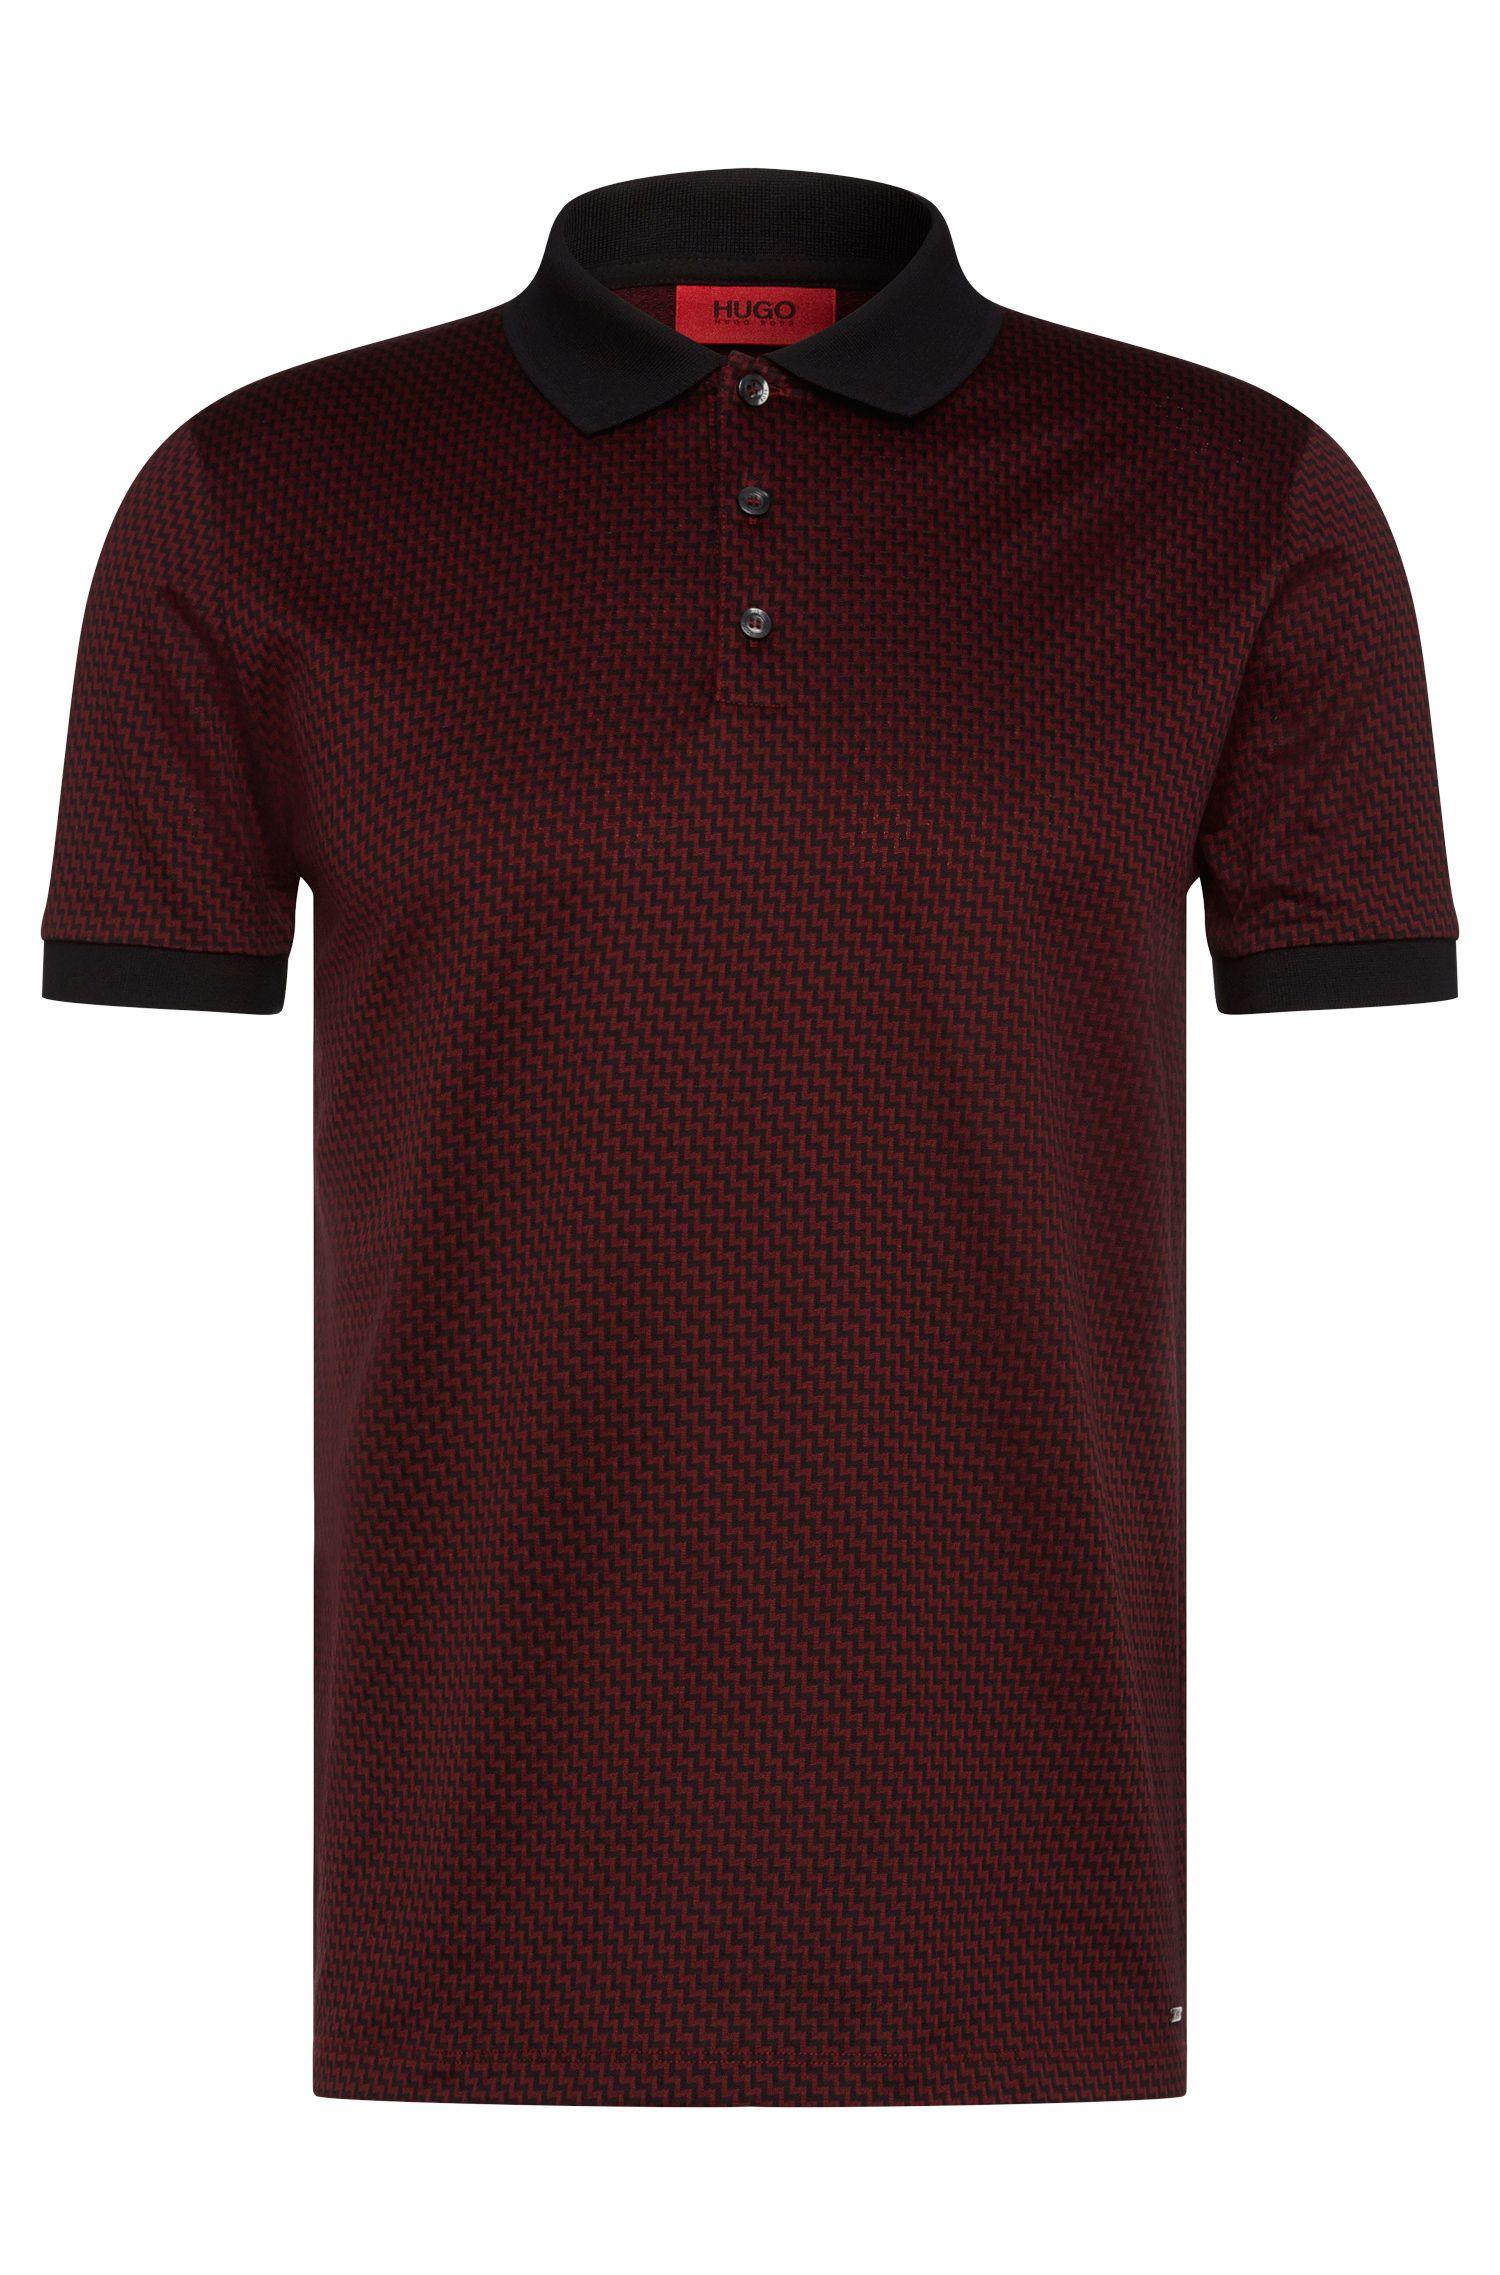 Gemustertes Regular-Fit Poloshirt aus Baumwolle: 'Devron'